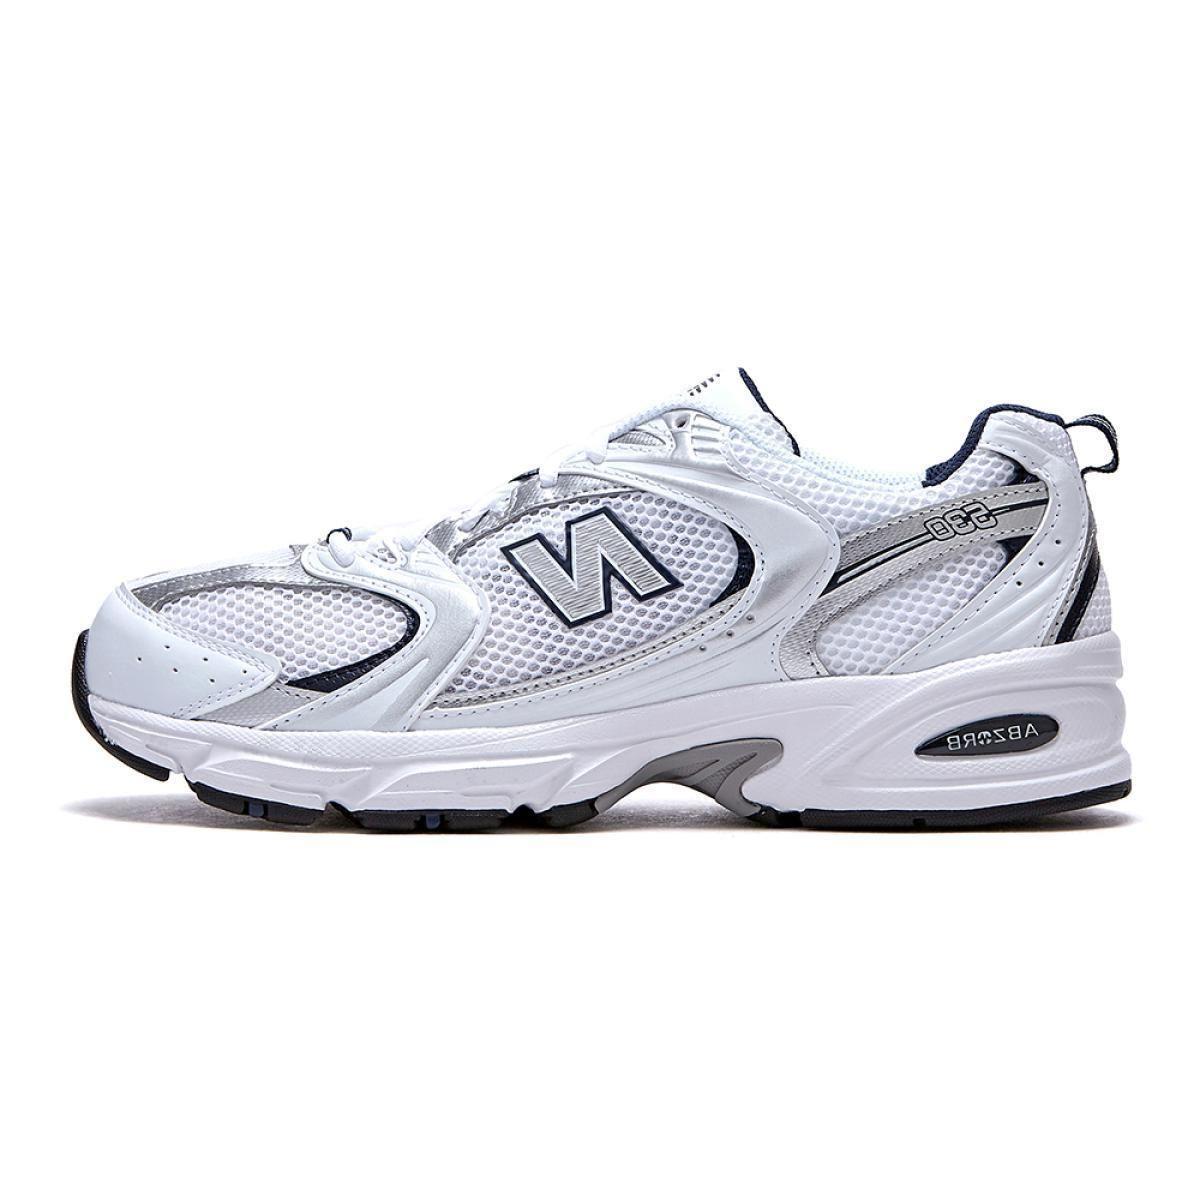 Por el contrario Lago taupo Fiesta  New Balance] 530 - White(MR530SG) in 2020 | Retro running shoes, Hype  shoes, Shoes